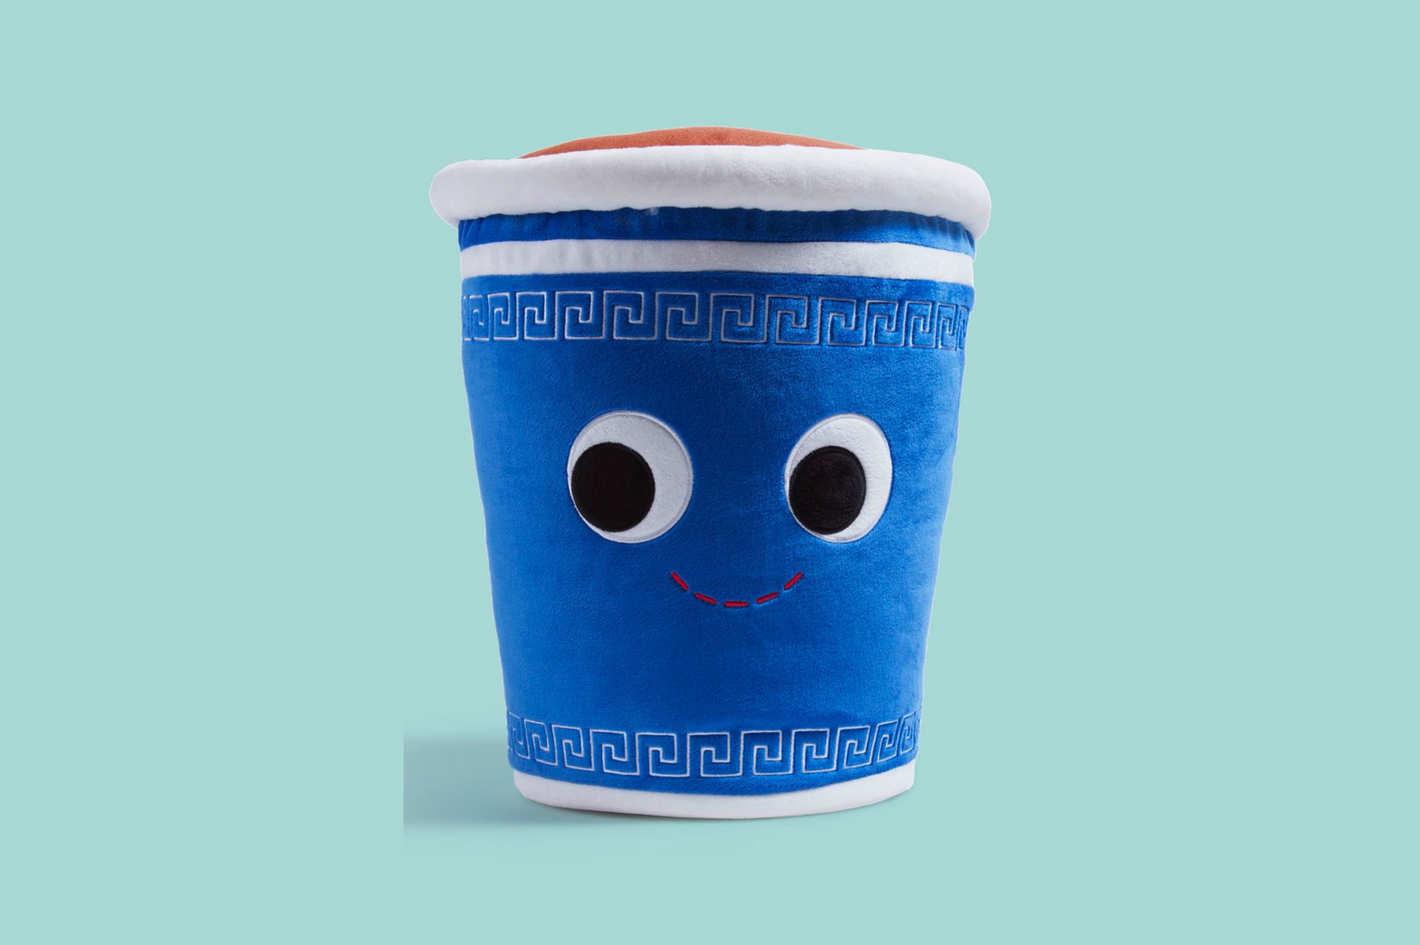 Kid Robot Yummy World Large George Greek Coffee Plush Toy